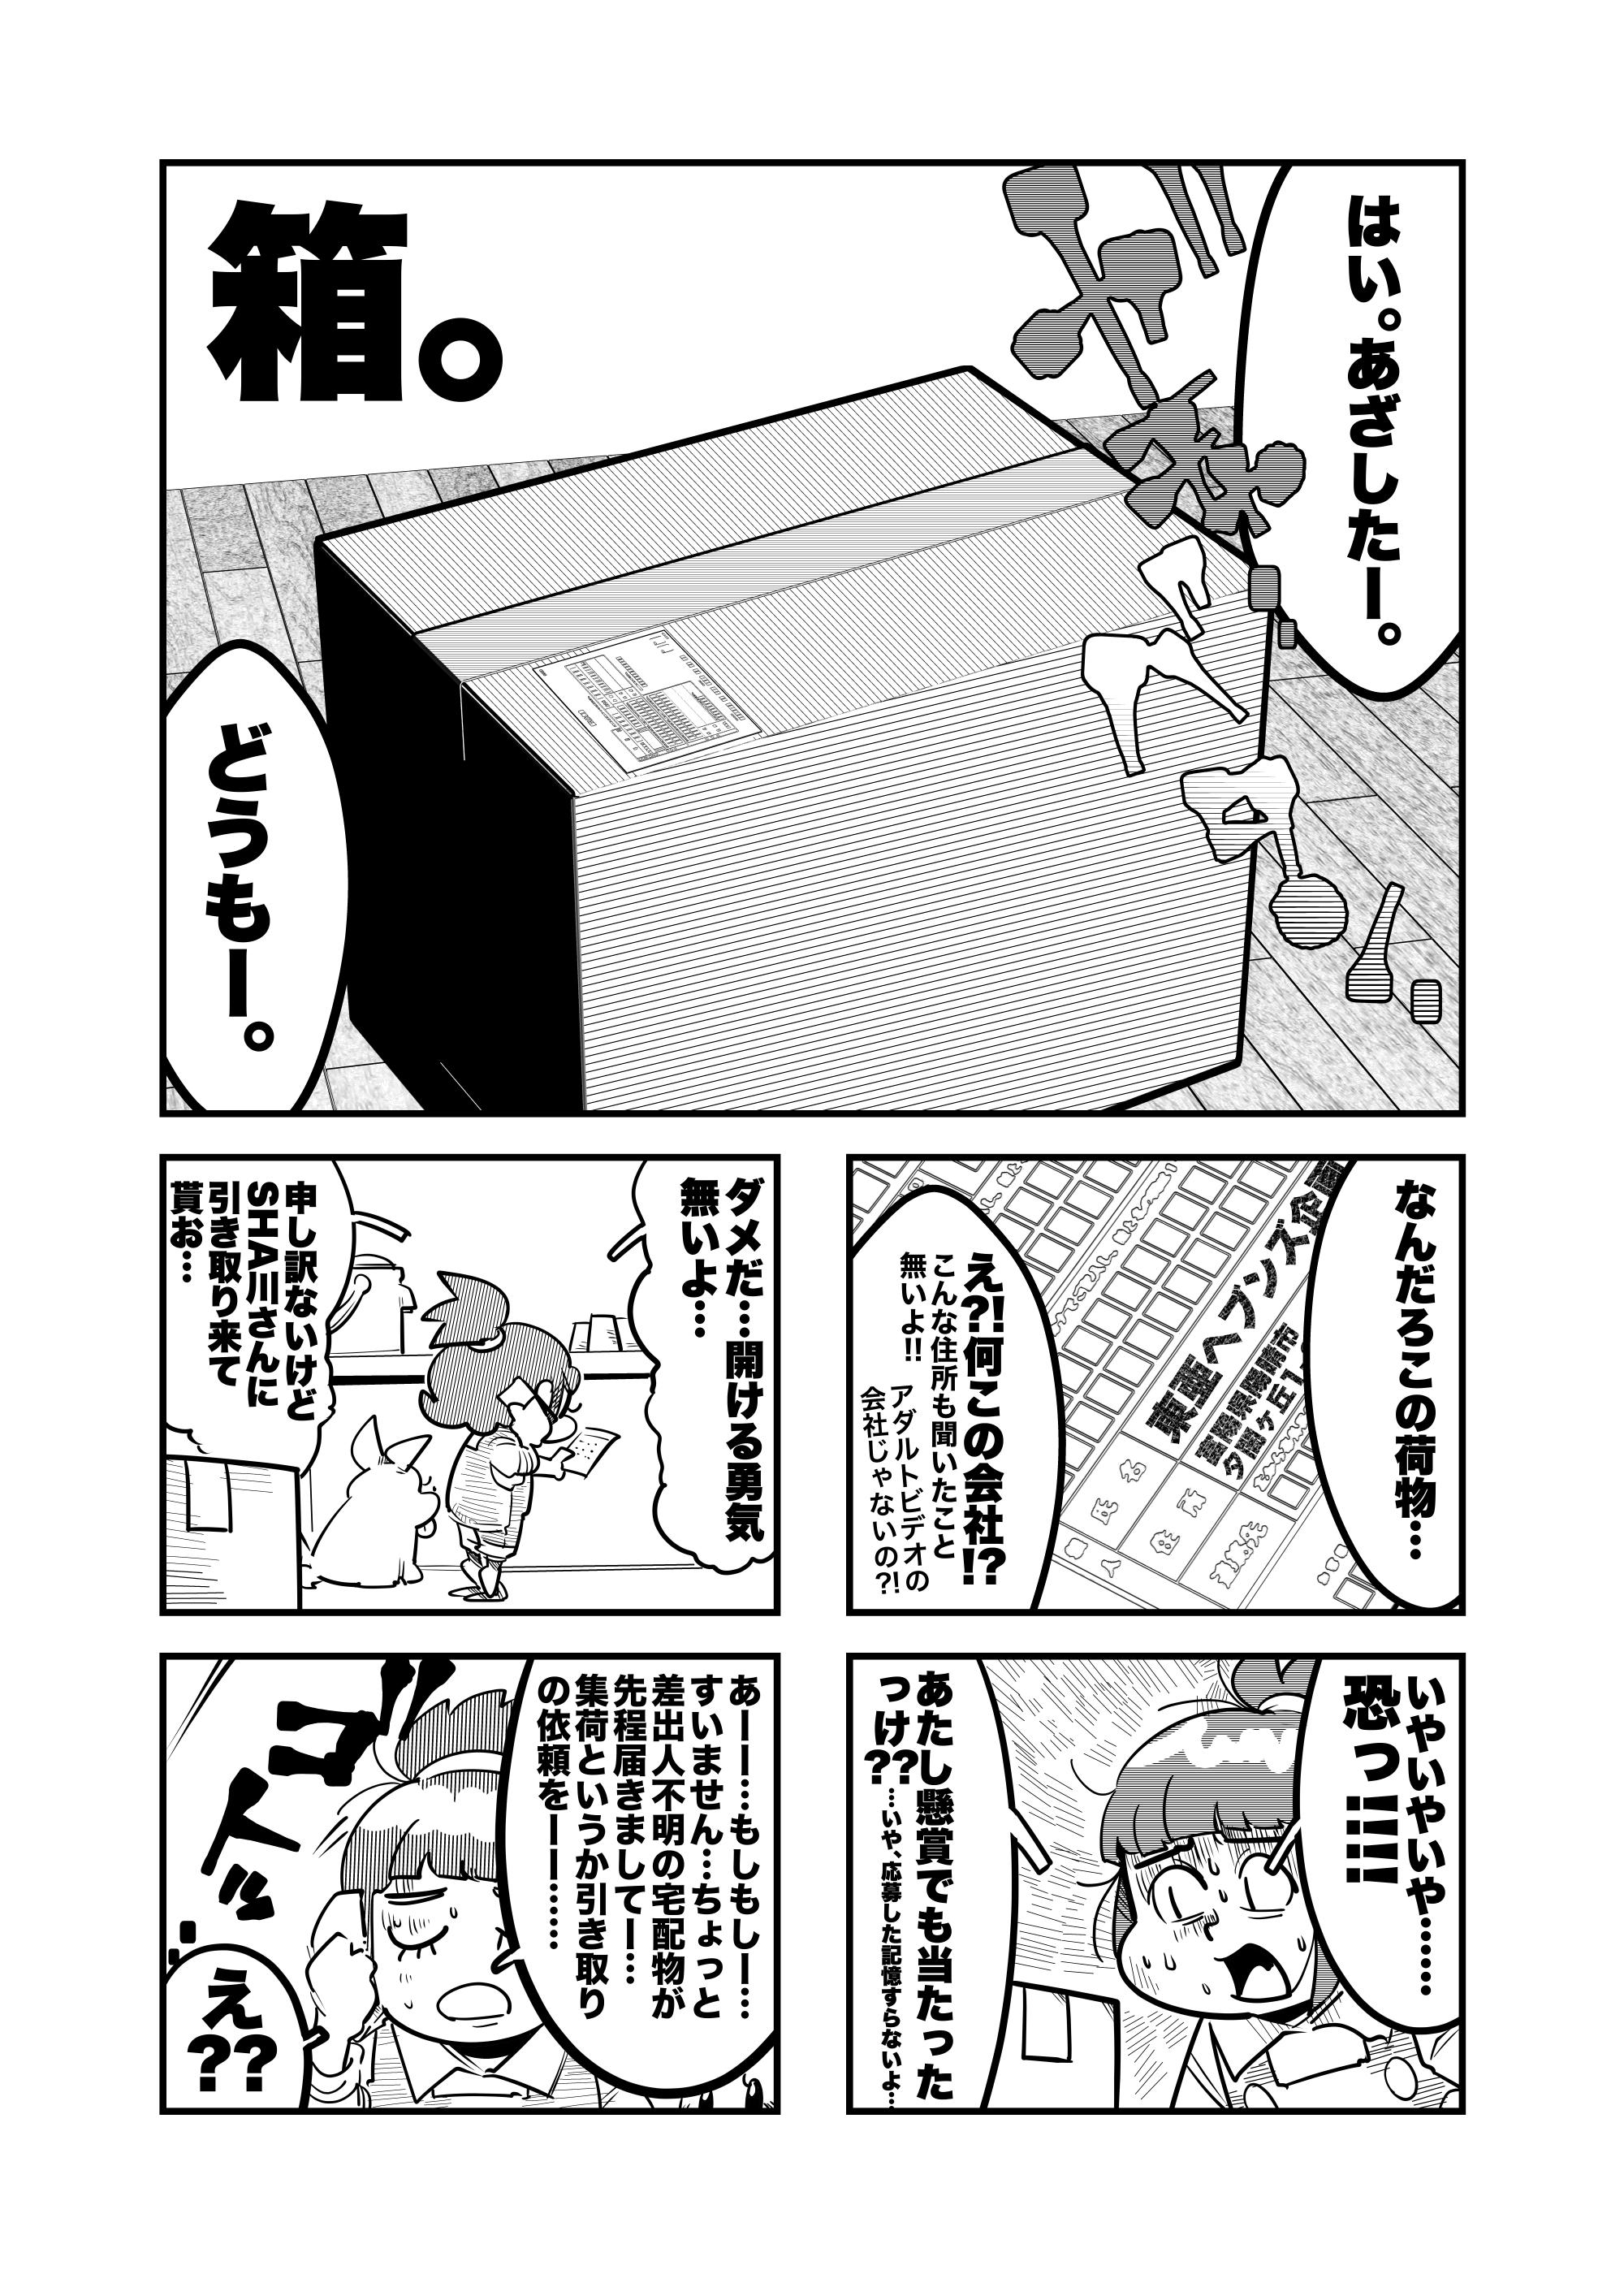 f:id:terashimaru117:20210915014334p:plain